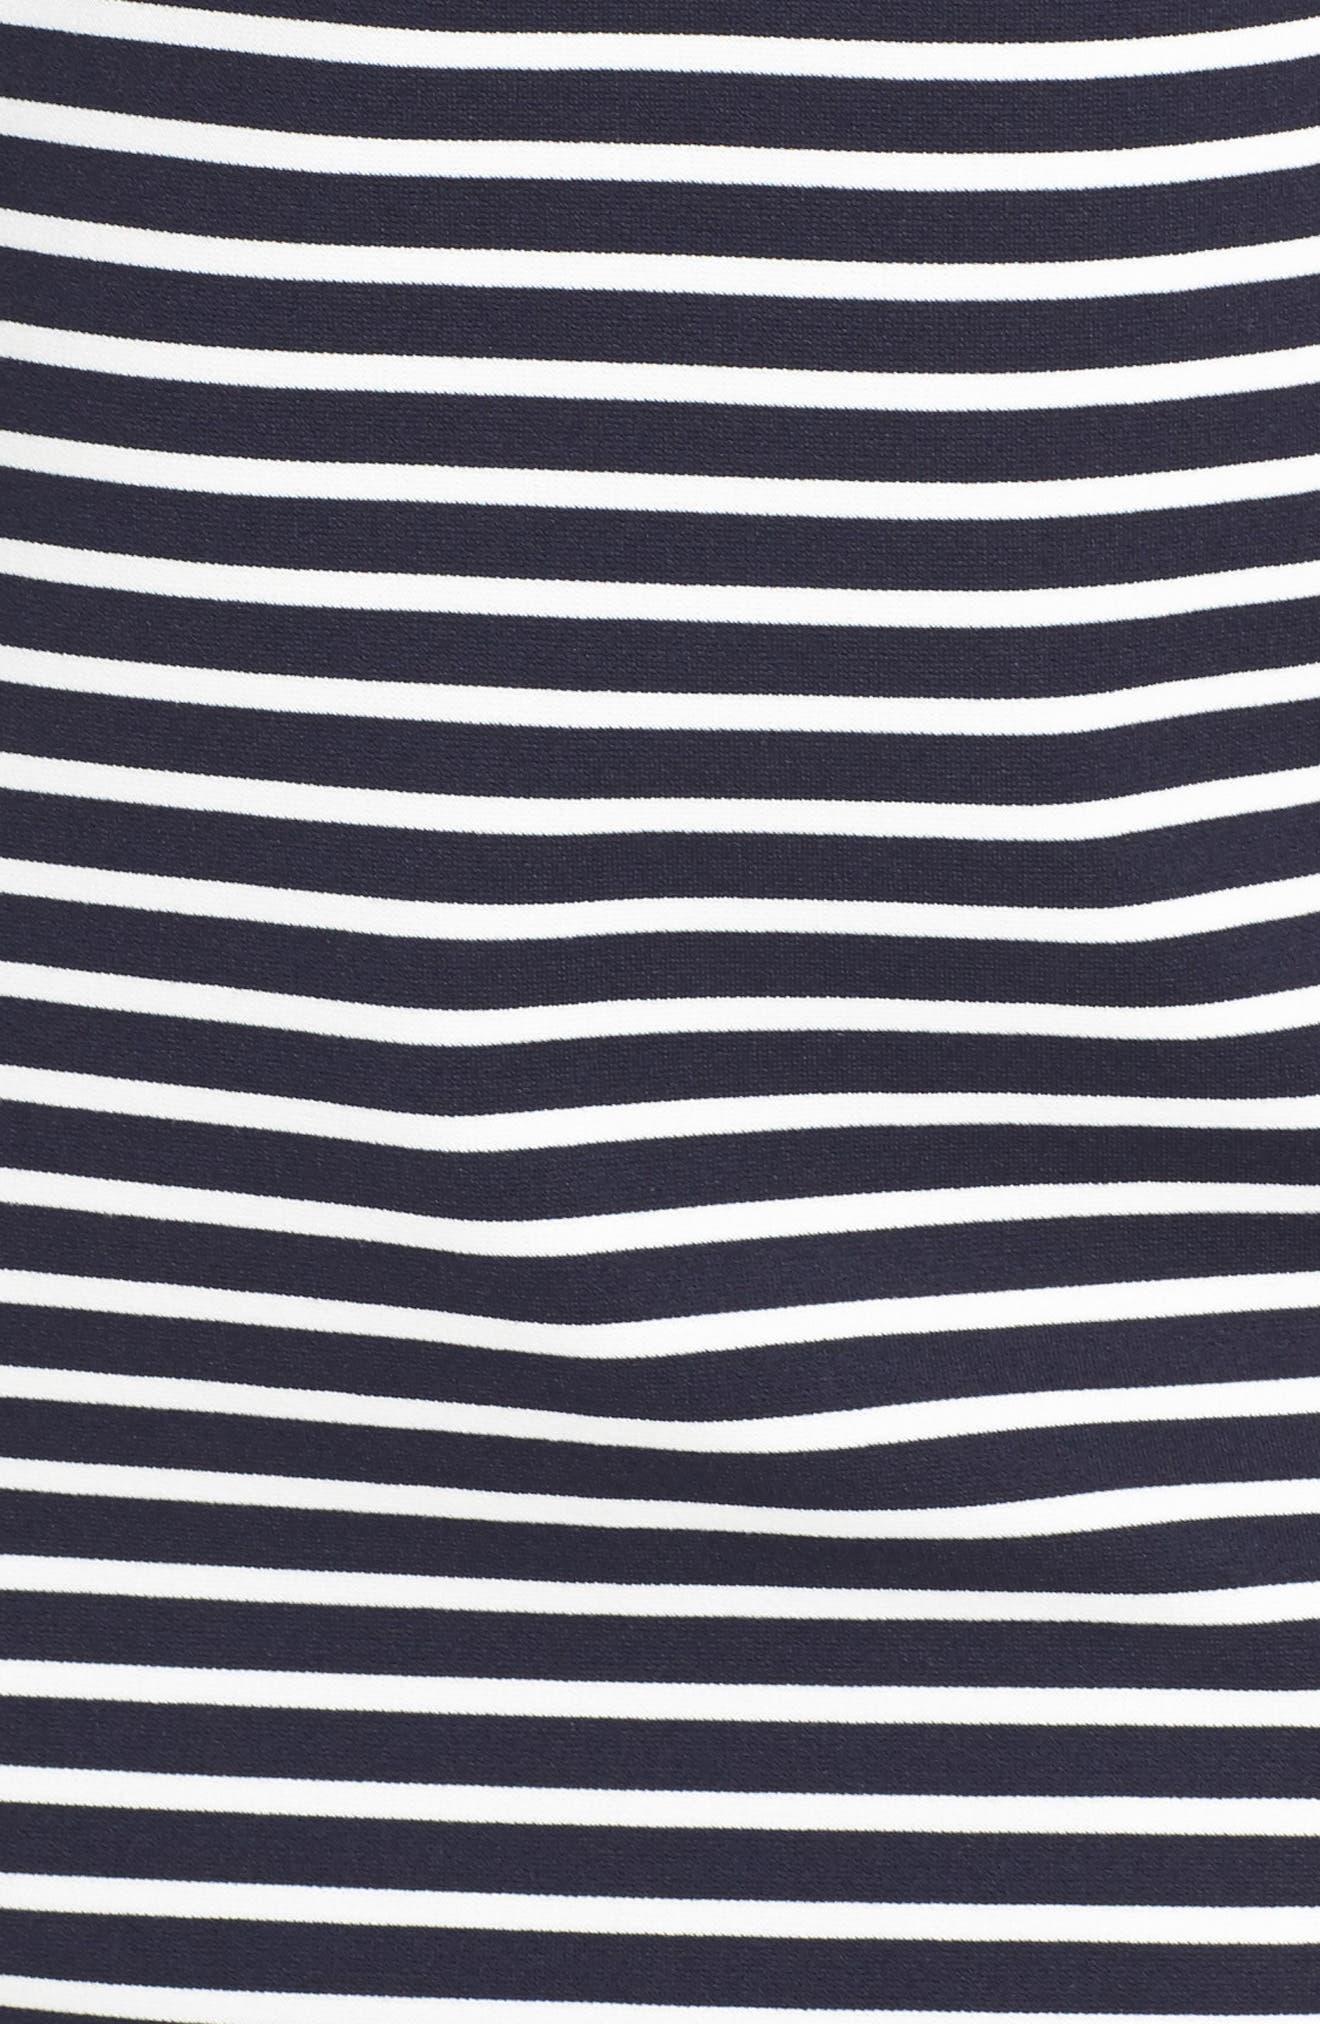 Stripe Stretch Knit Sheath,                             Alternate thumbnail 5, color,                             Striped Ponte